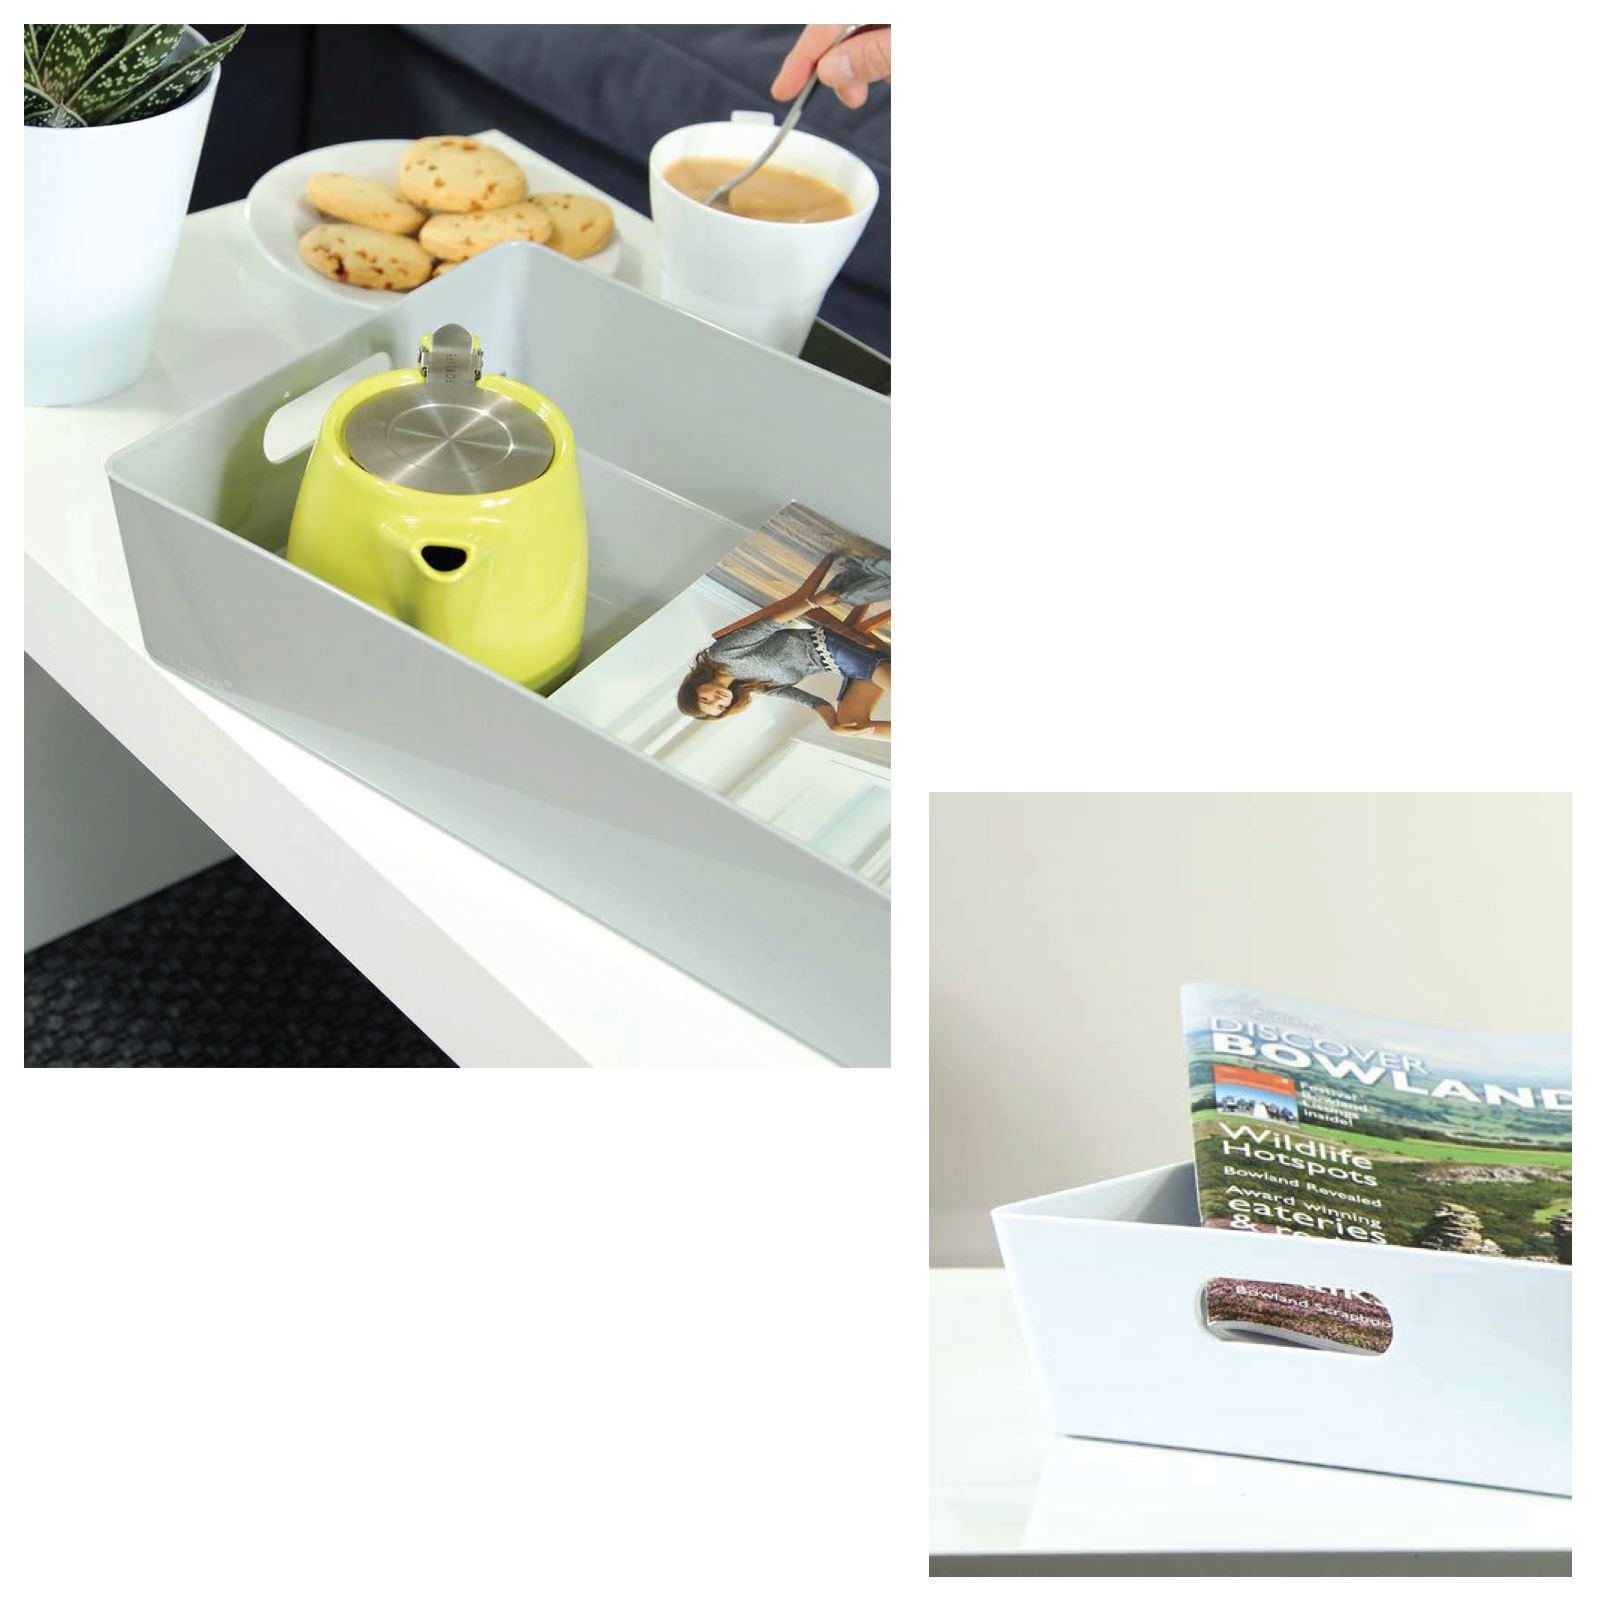 Plastic-Handy-Fruit-Vegetable-Home-Kitchen-Storage-Basket-Crate-Tidy-Organiser thumbnail 9